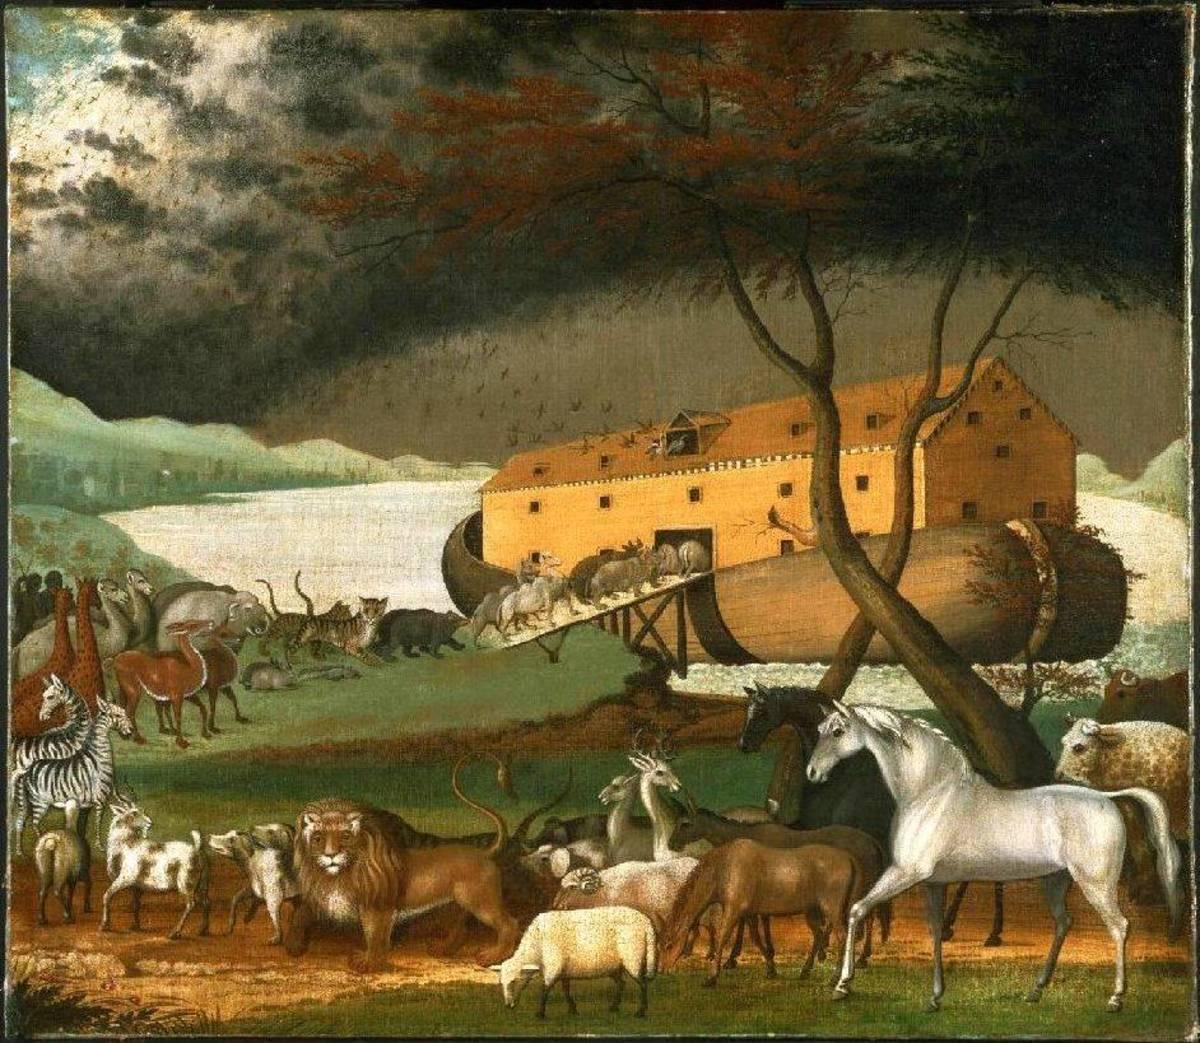 Noah's Ark resting on Mount Ararat.